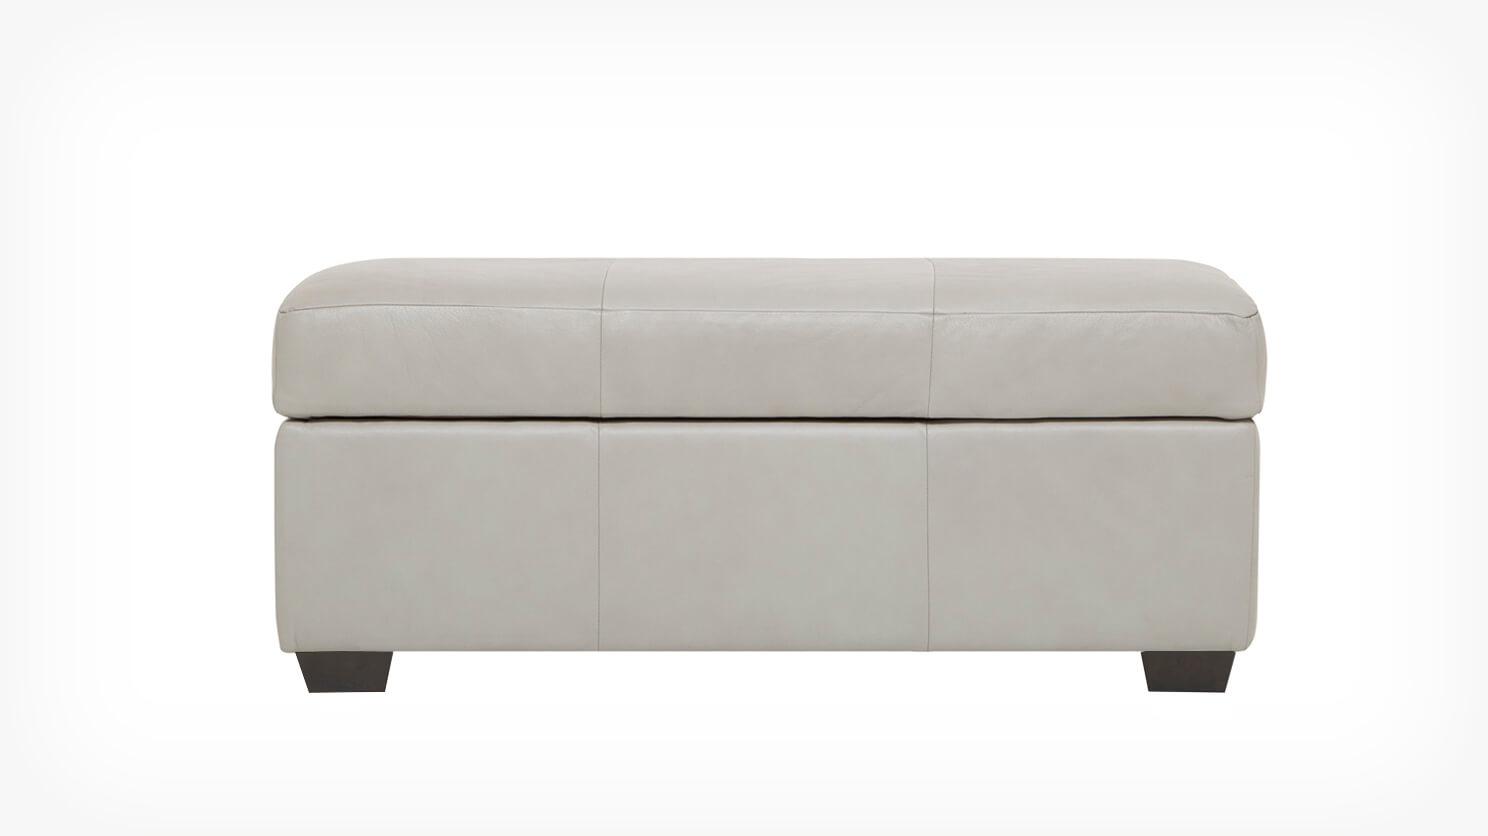 z gallerie stella sofa cleaning jennifer sofas reviews storage ottoman leather eq3